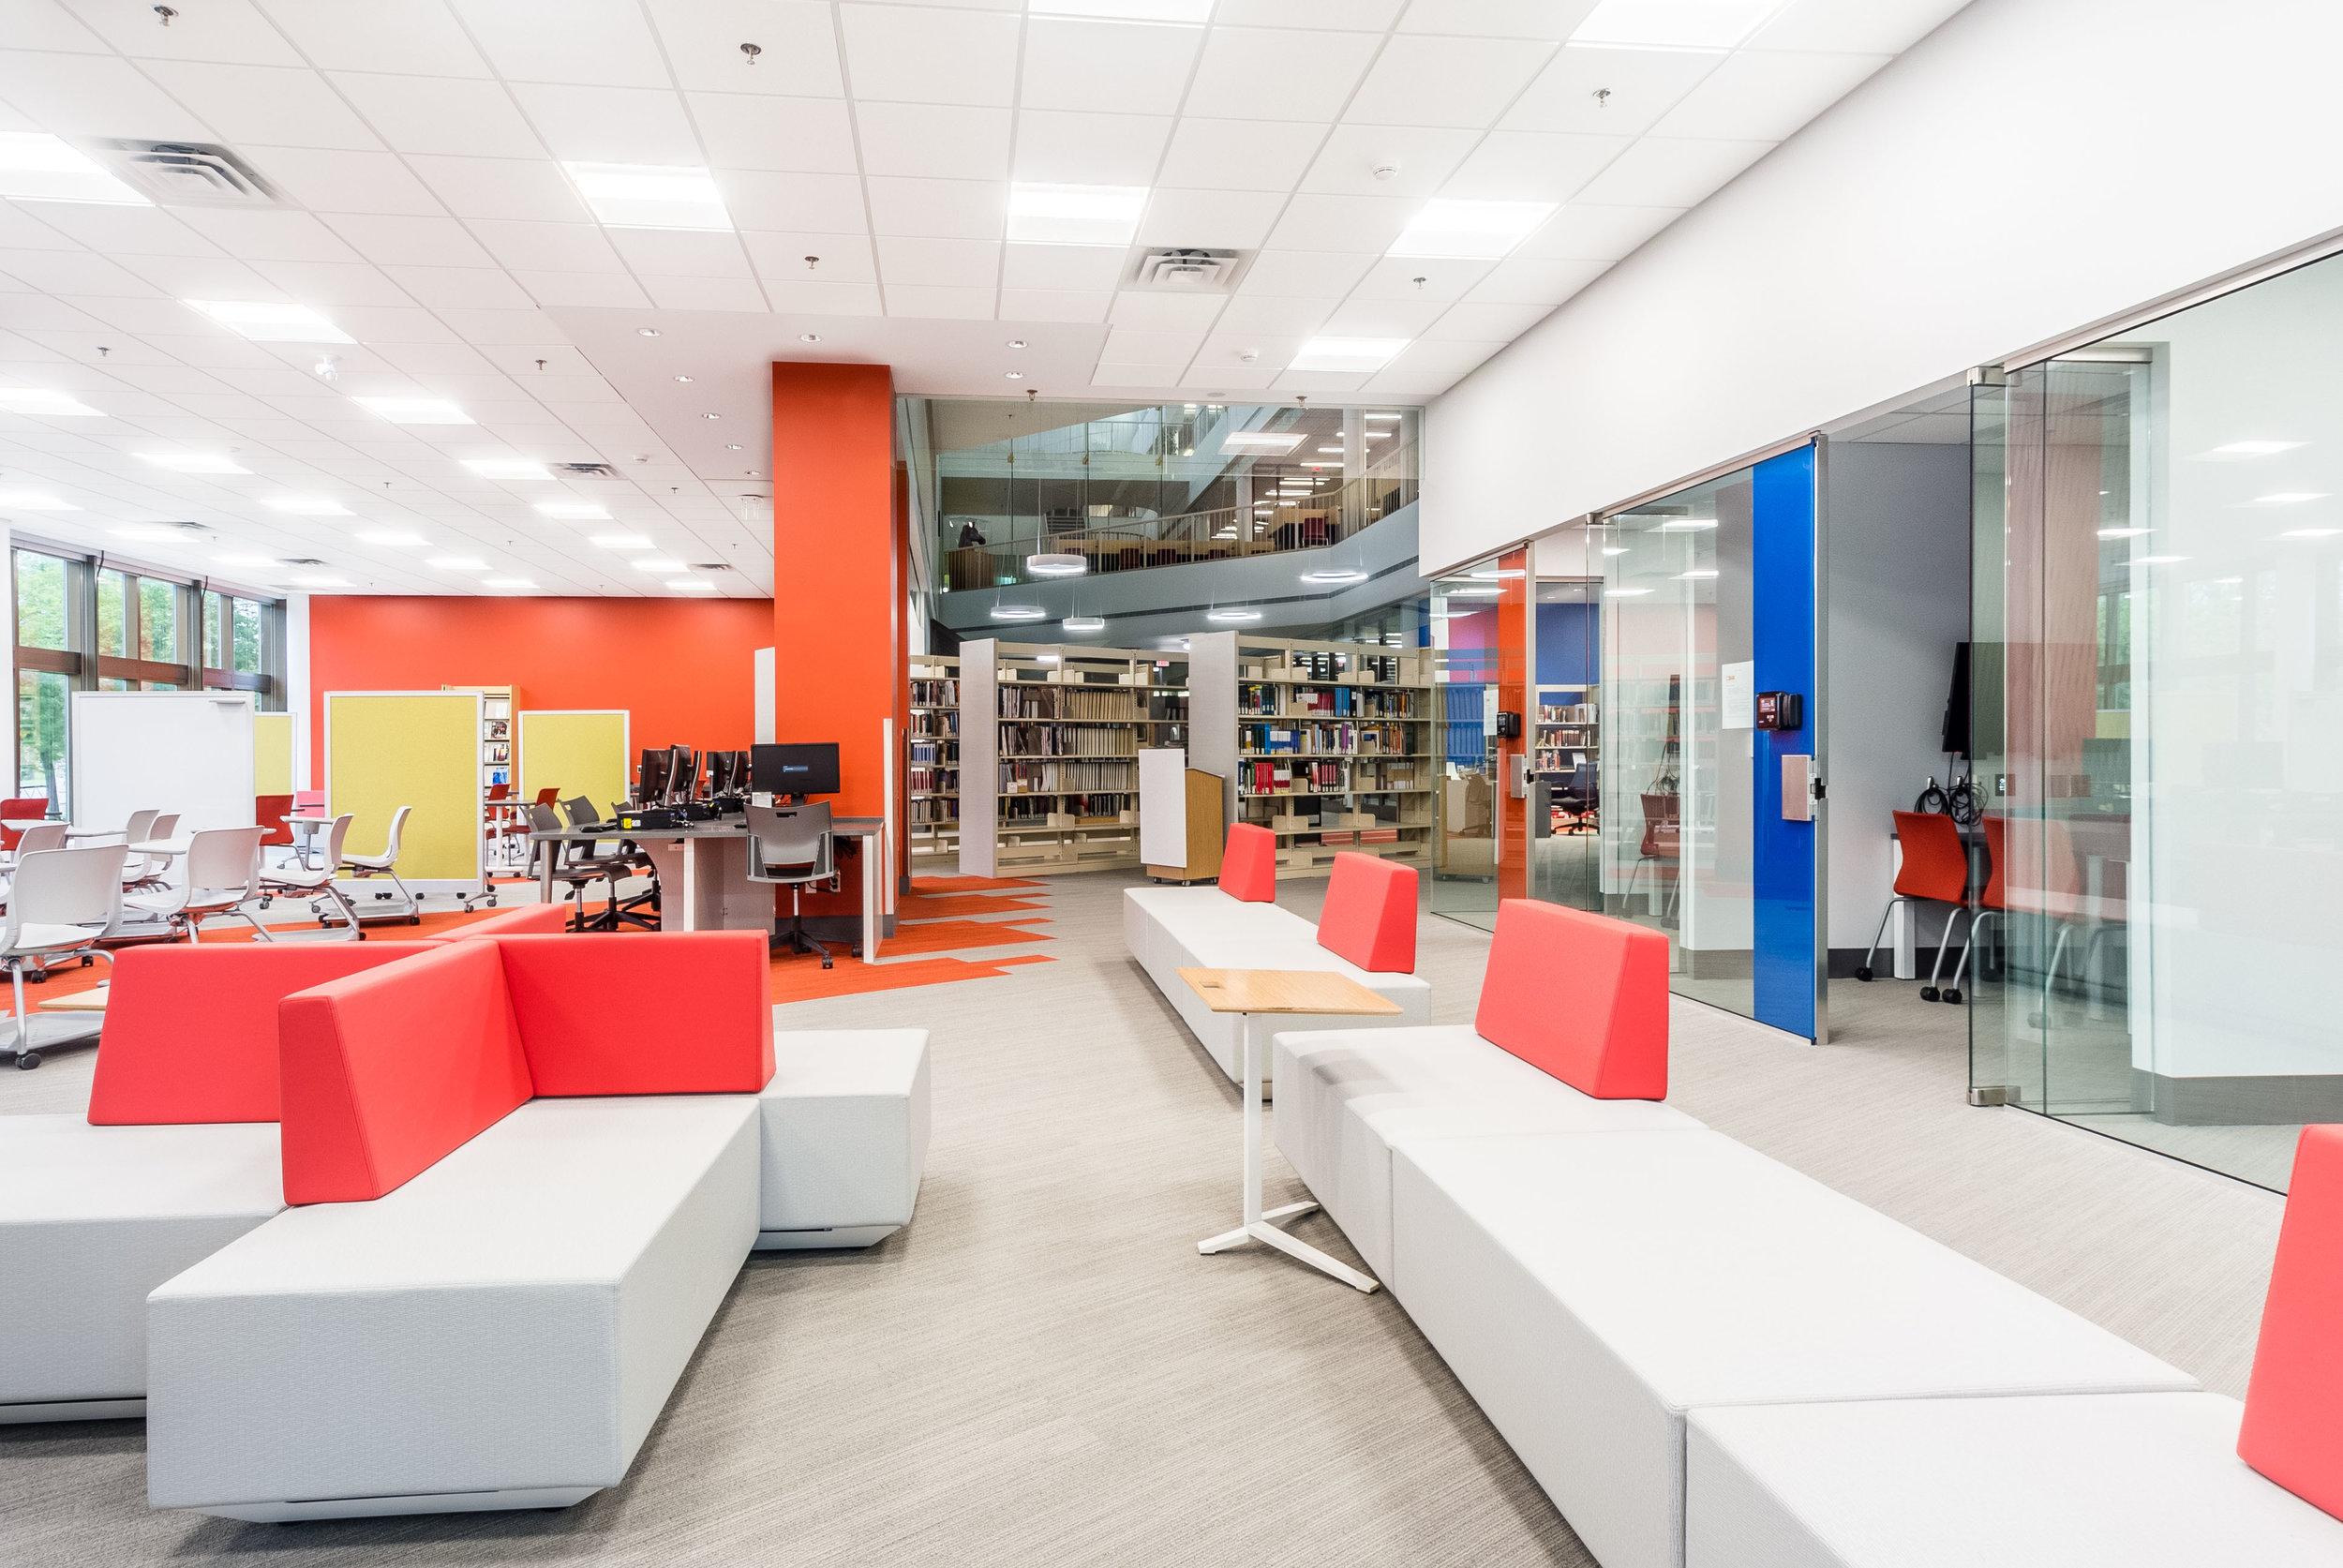 drake library mmp web 2017-6.jpg